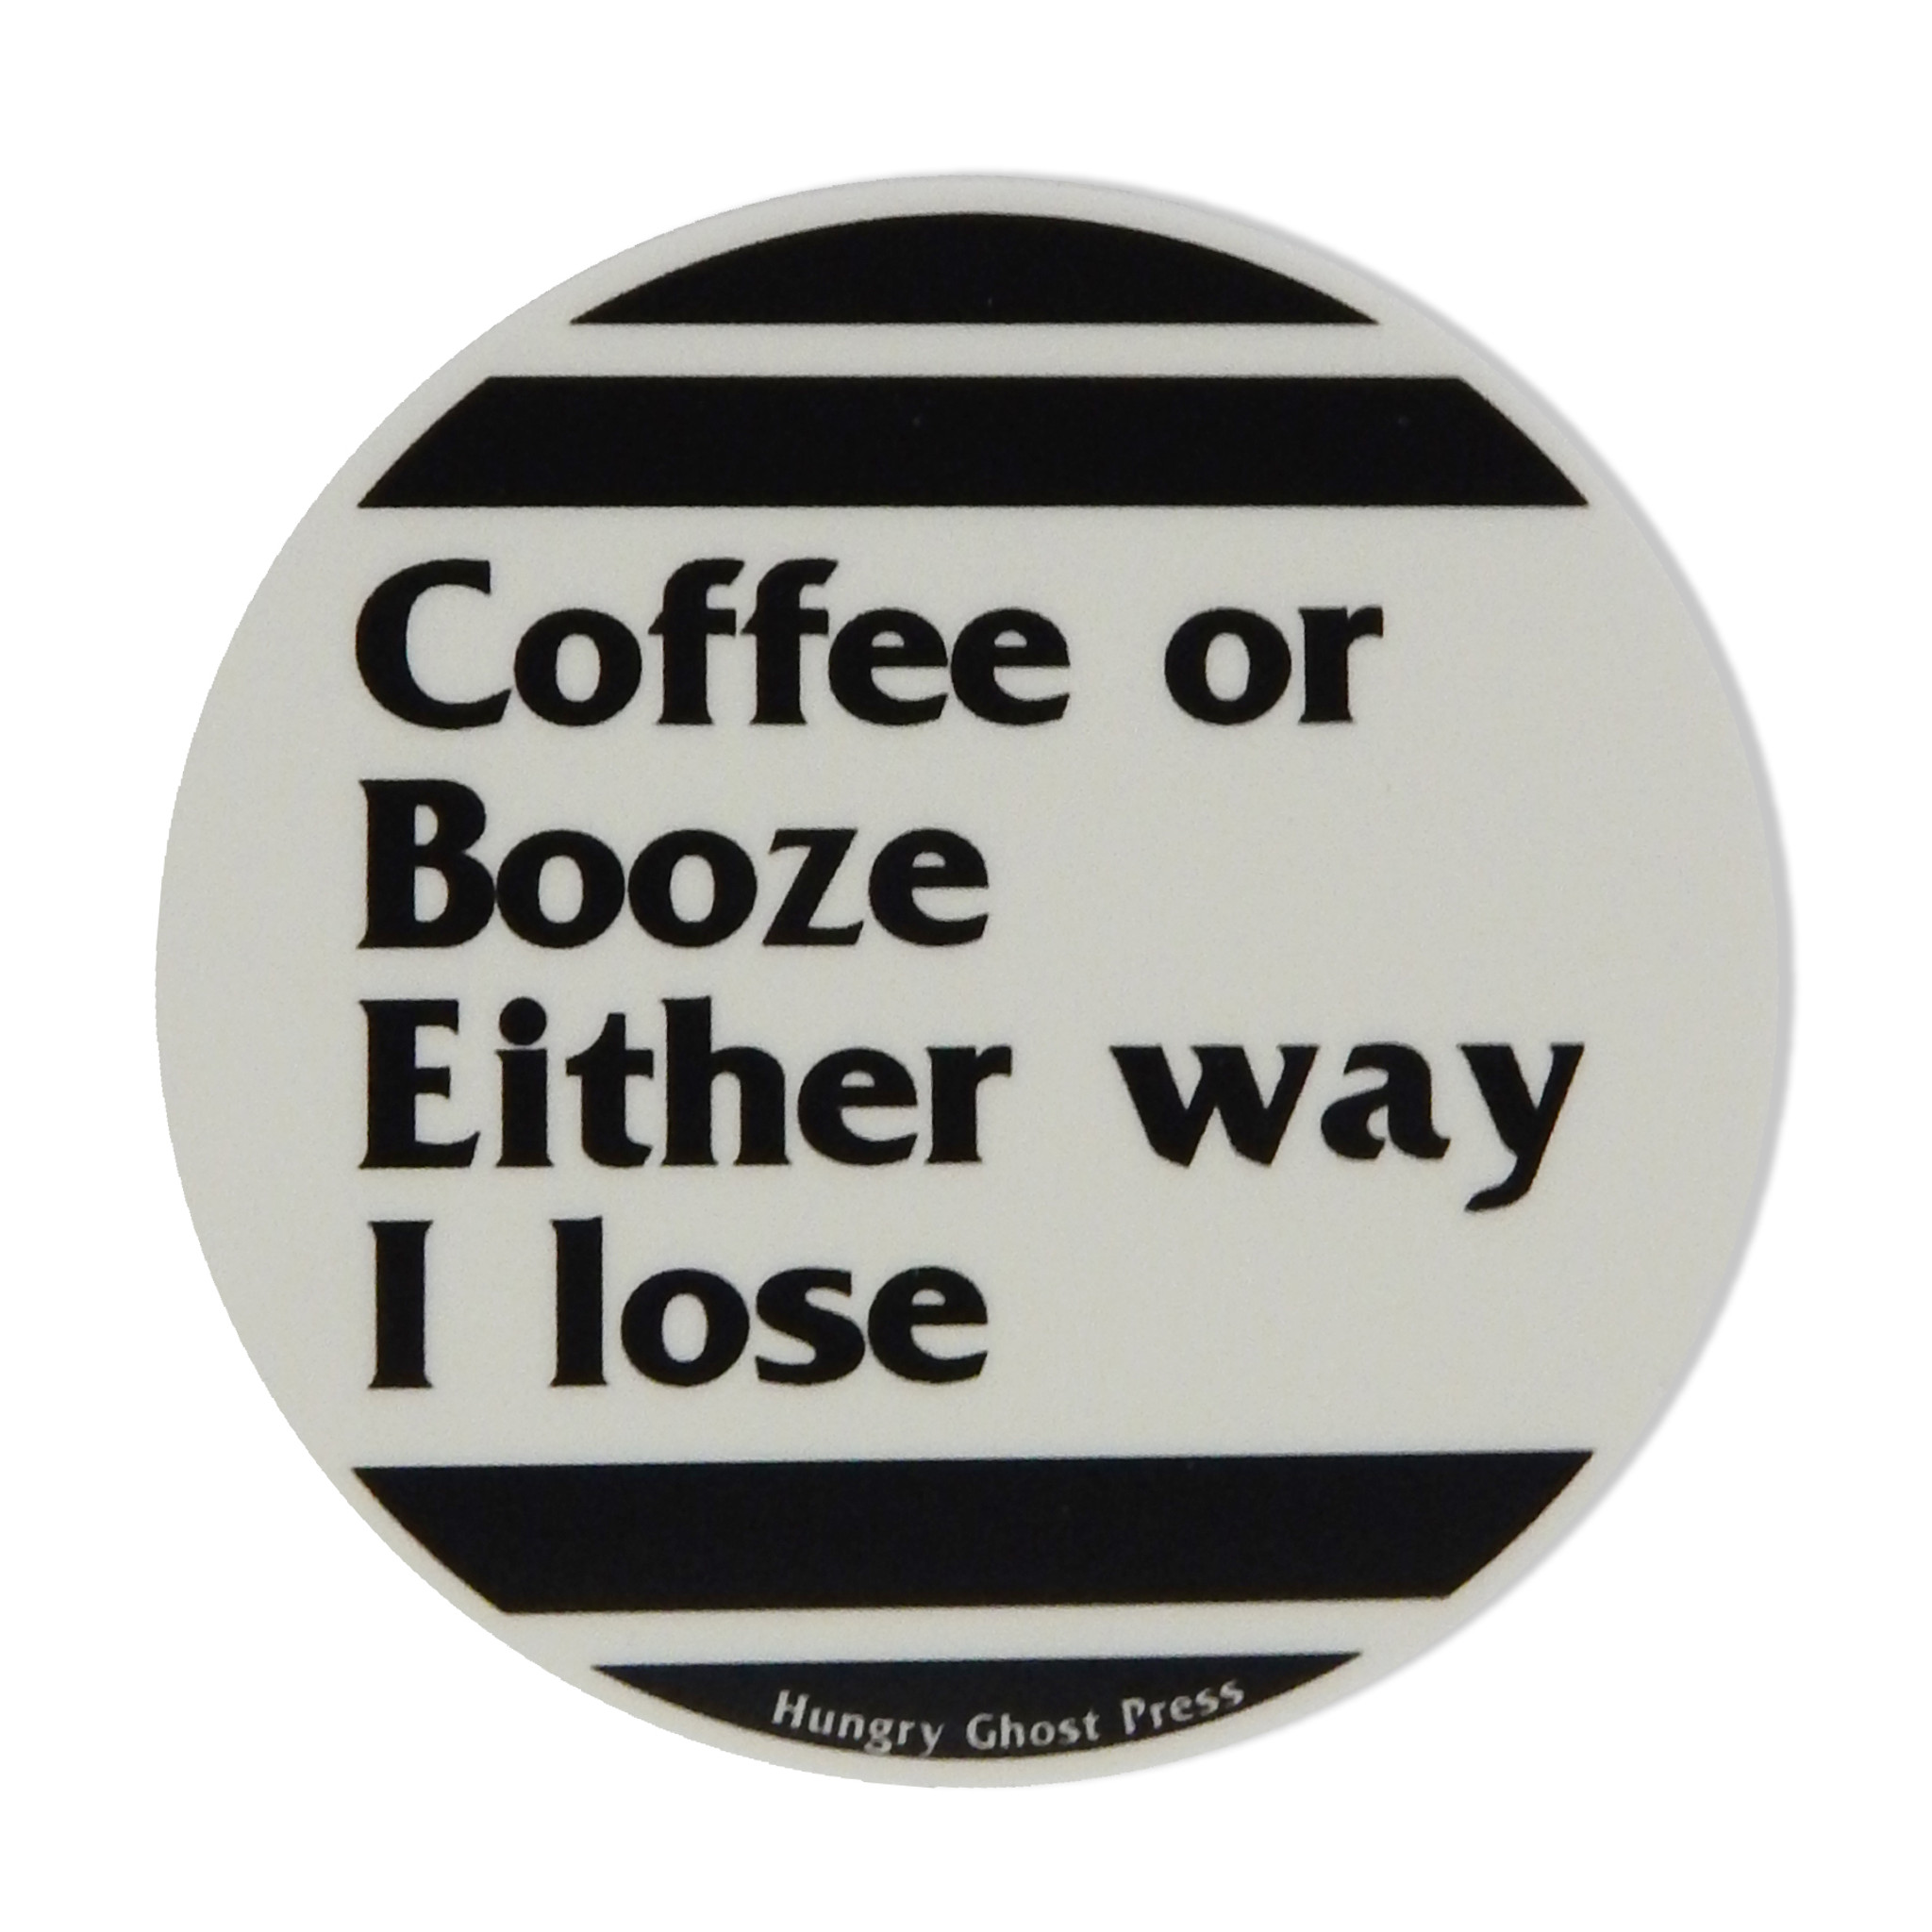 "Coffee or Booze 3"" Sticker"